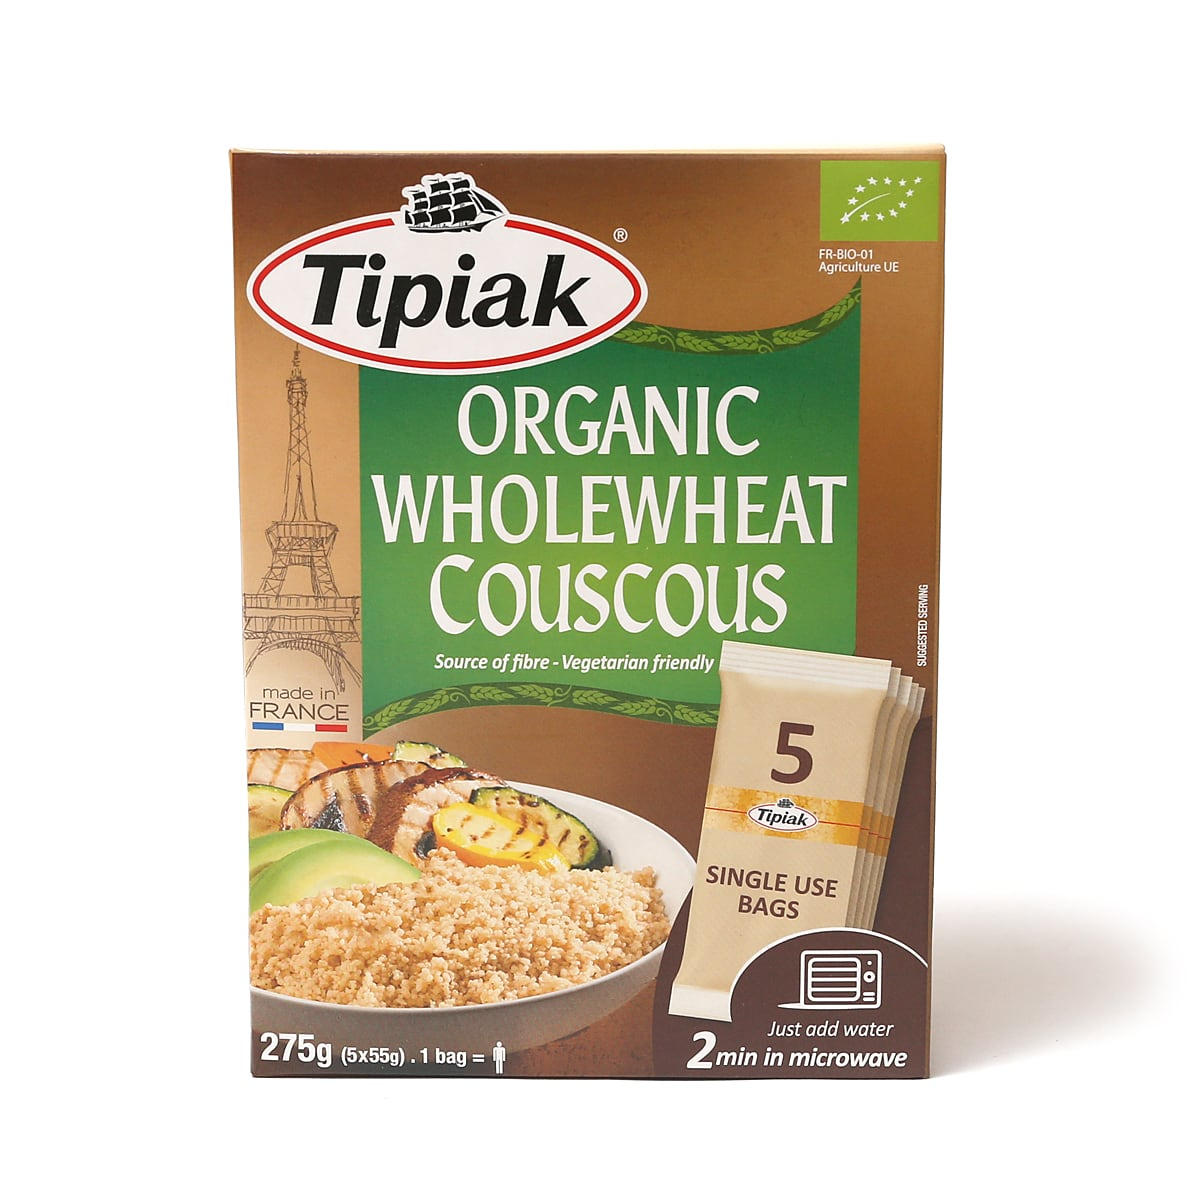 Tipiak オーガニックホールウィートクスクス 1箱